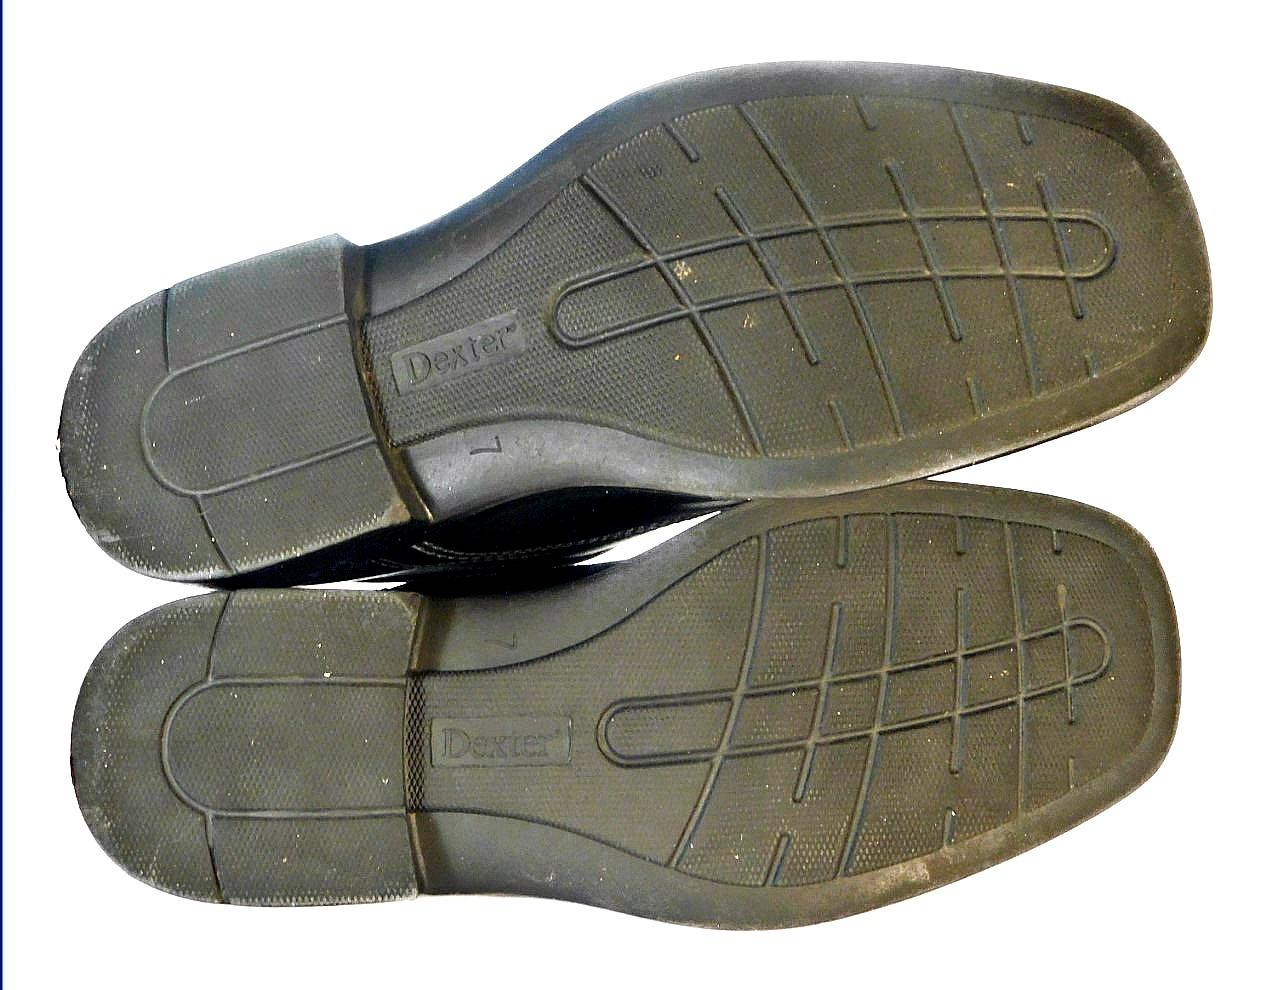 Dexter Men's Comfort Black Leather Square Toe Oxford Casual Shoes  Size 7